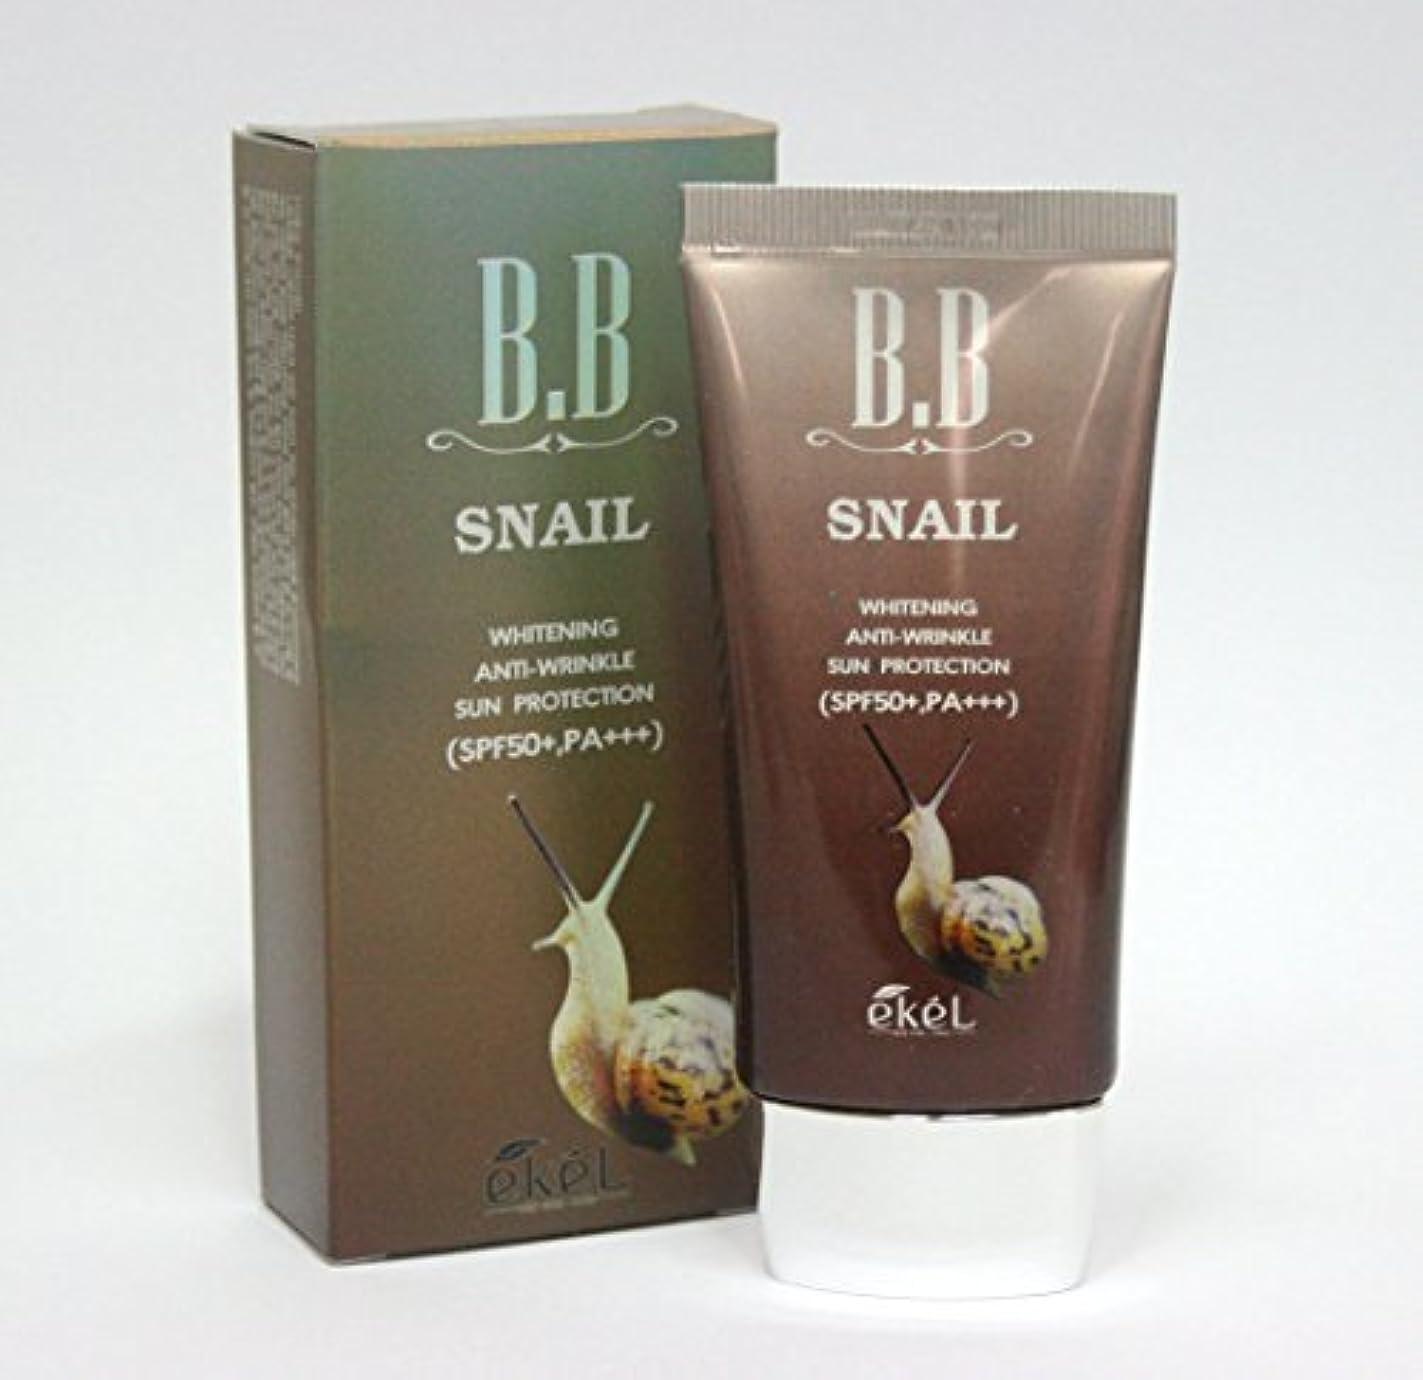 [Ekel] カタツムリBBクリーム50ml / ホワイトニング , SPF50 + PA +++ / 韓国化粧品 / Snail BB Cream 50ml / Whitening, SPF50+ PA+++ / Korea...